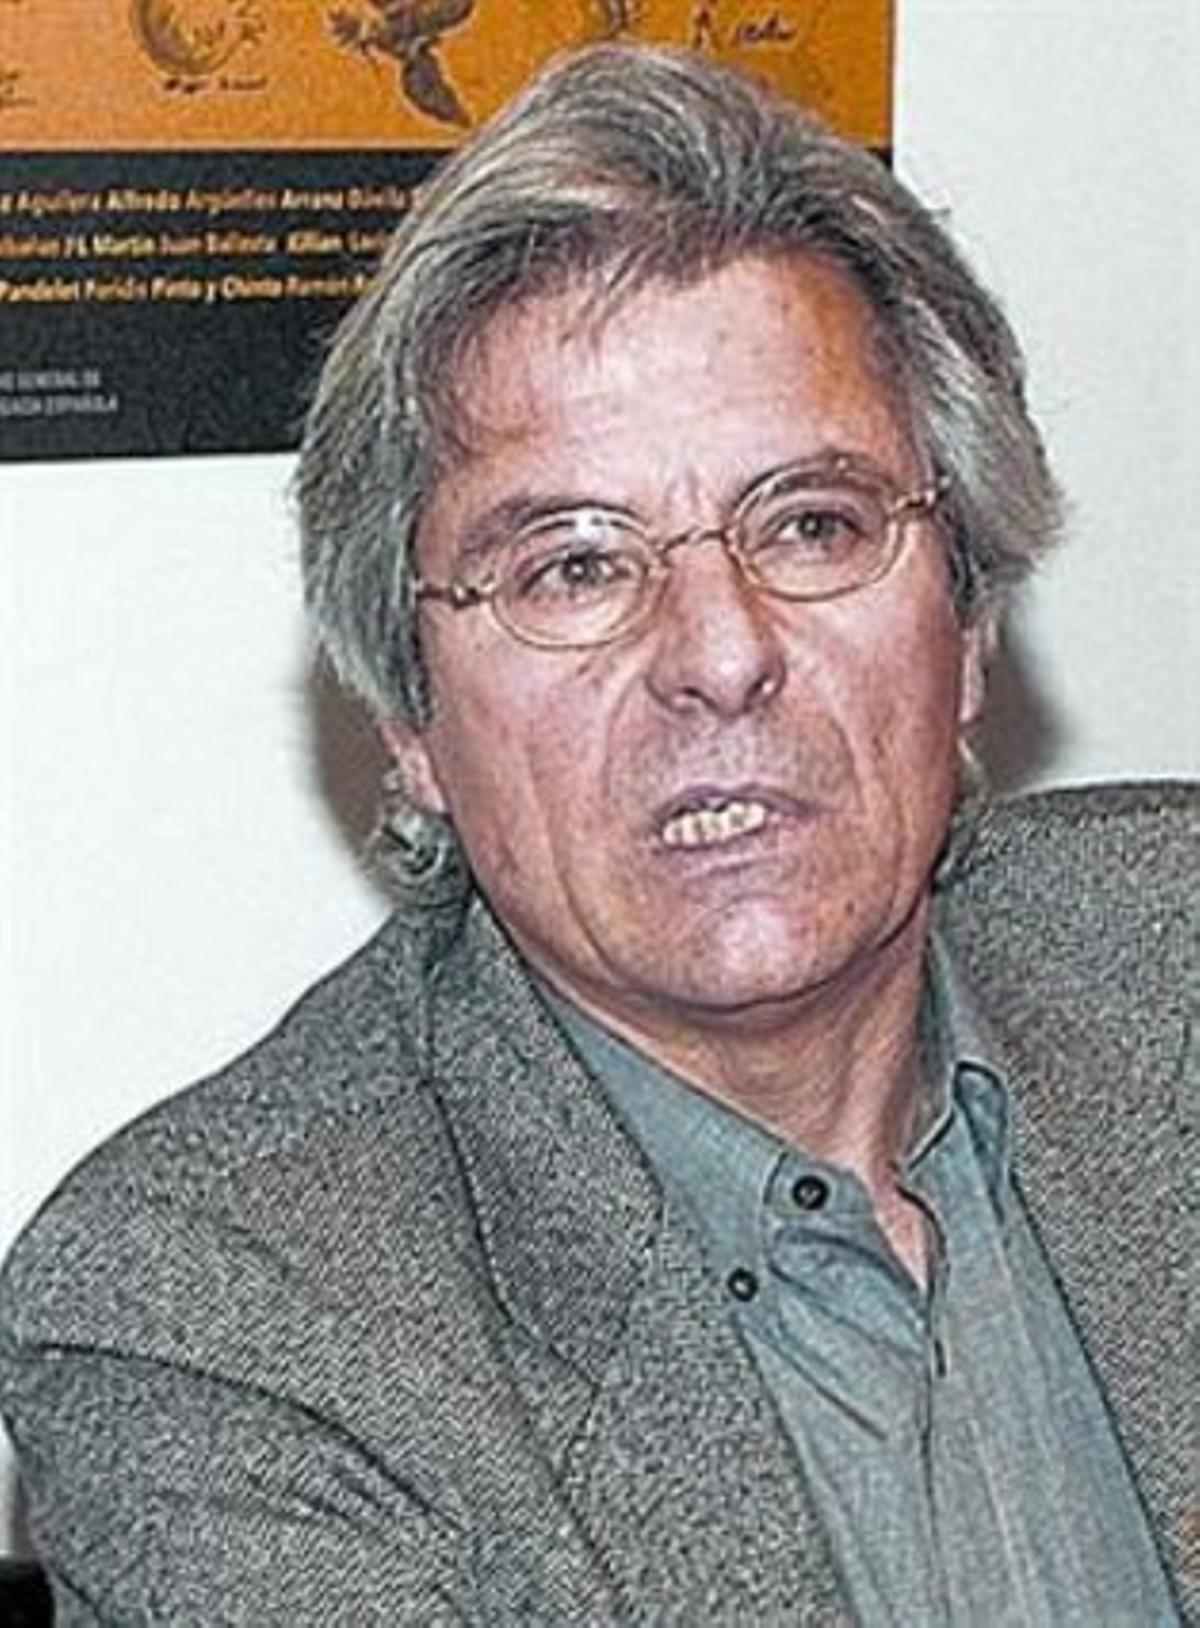 Javier Nart, número 1 de la lista.